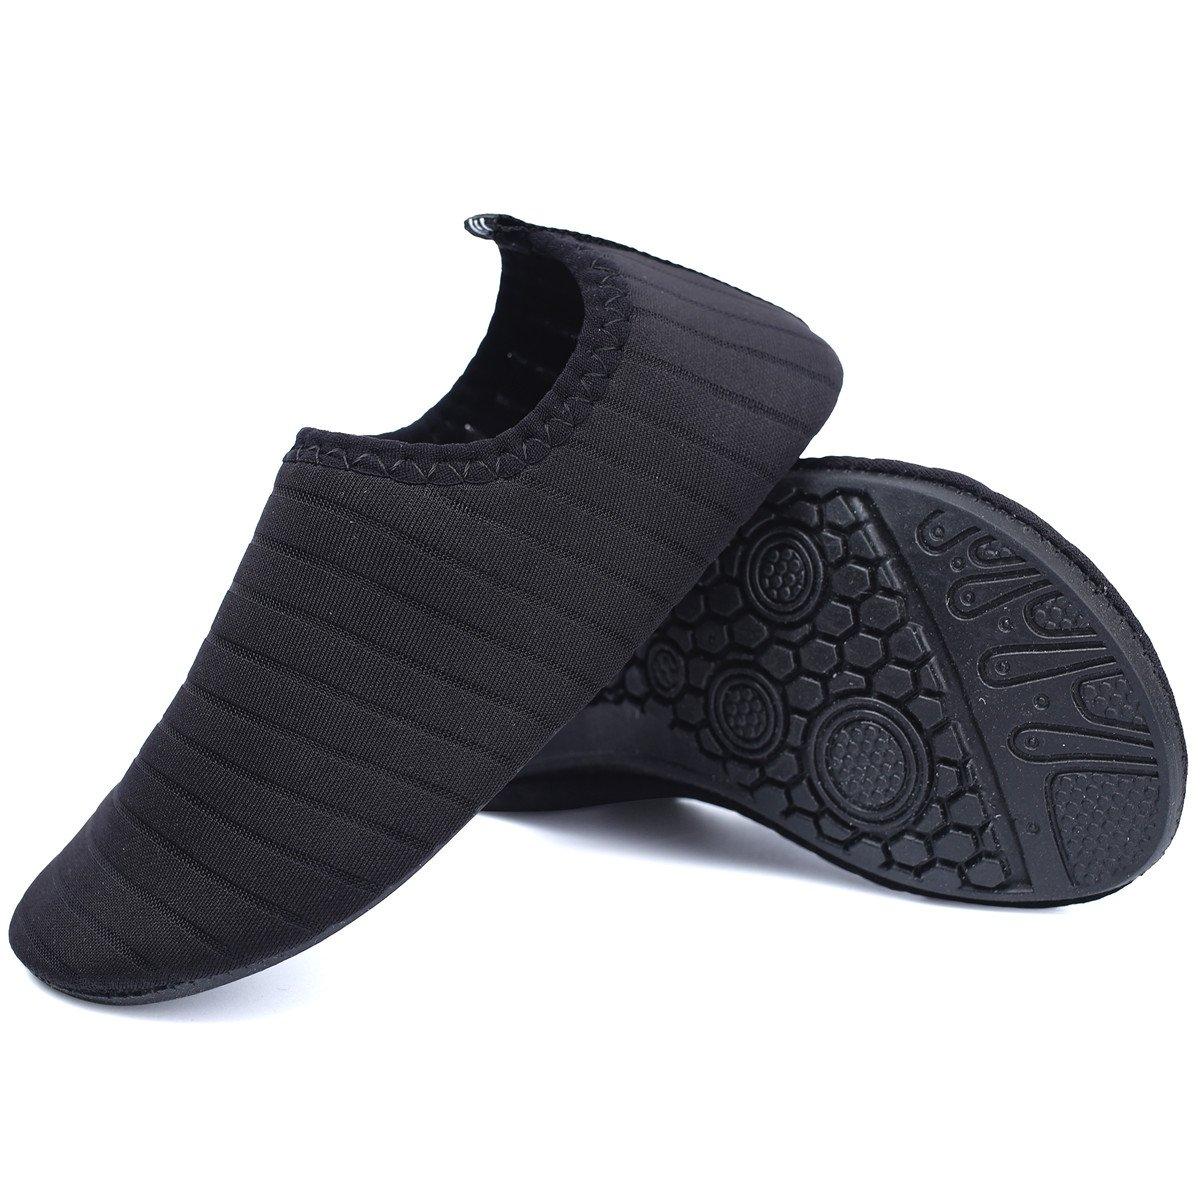 JIASUQI Kids Boys and Girls Summer Athletic Water Shoes Aqua Socks for Beach Swimming Pool JIASUQI-CT02C